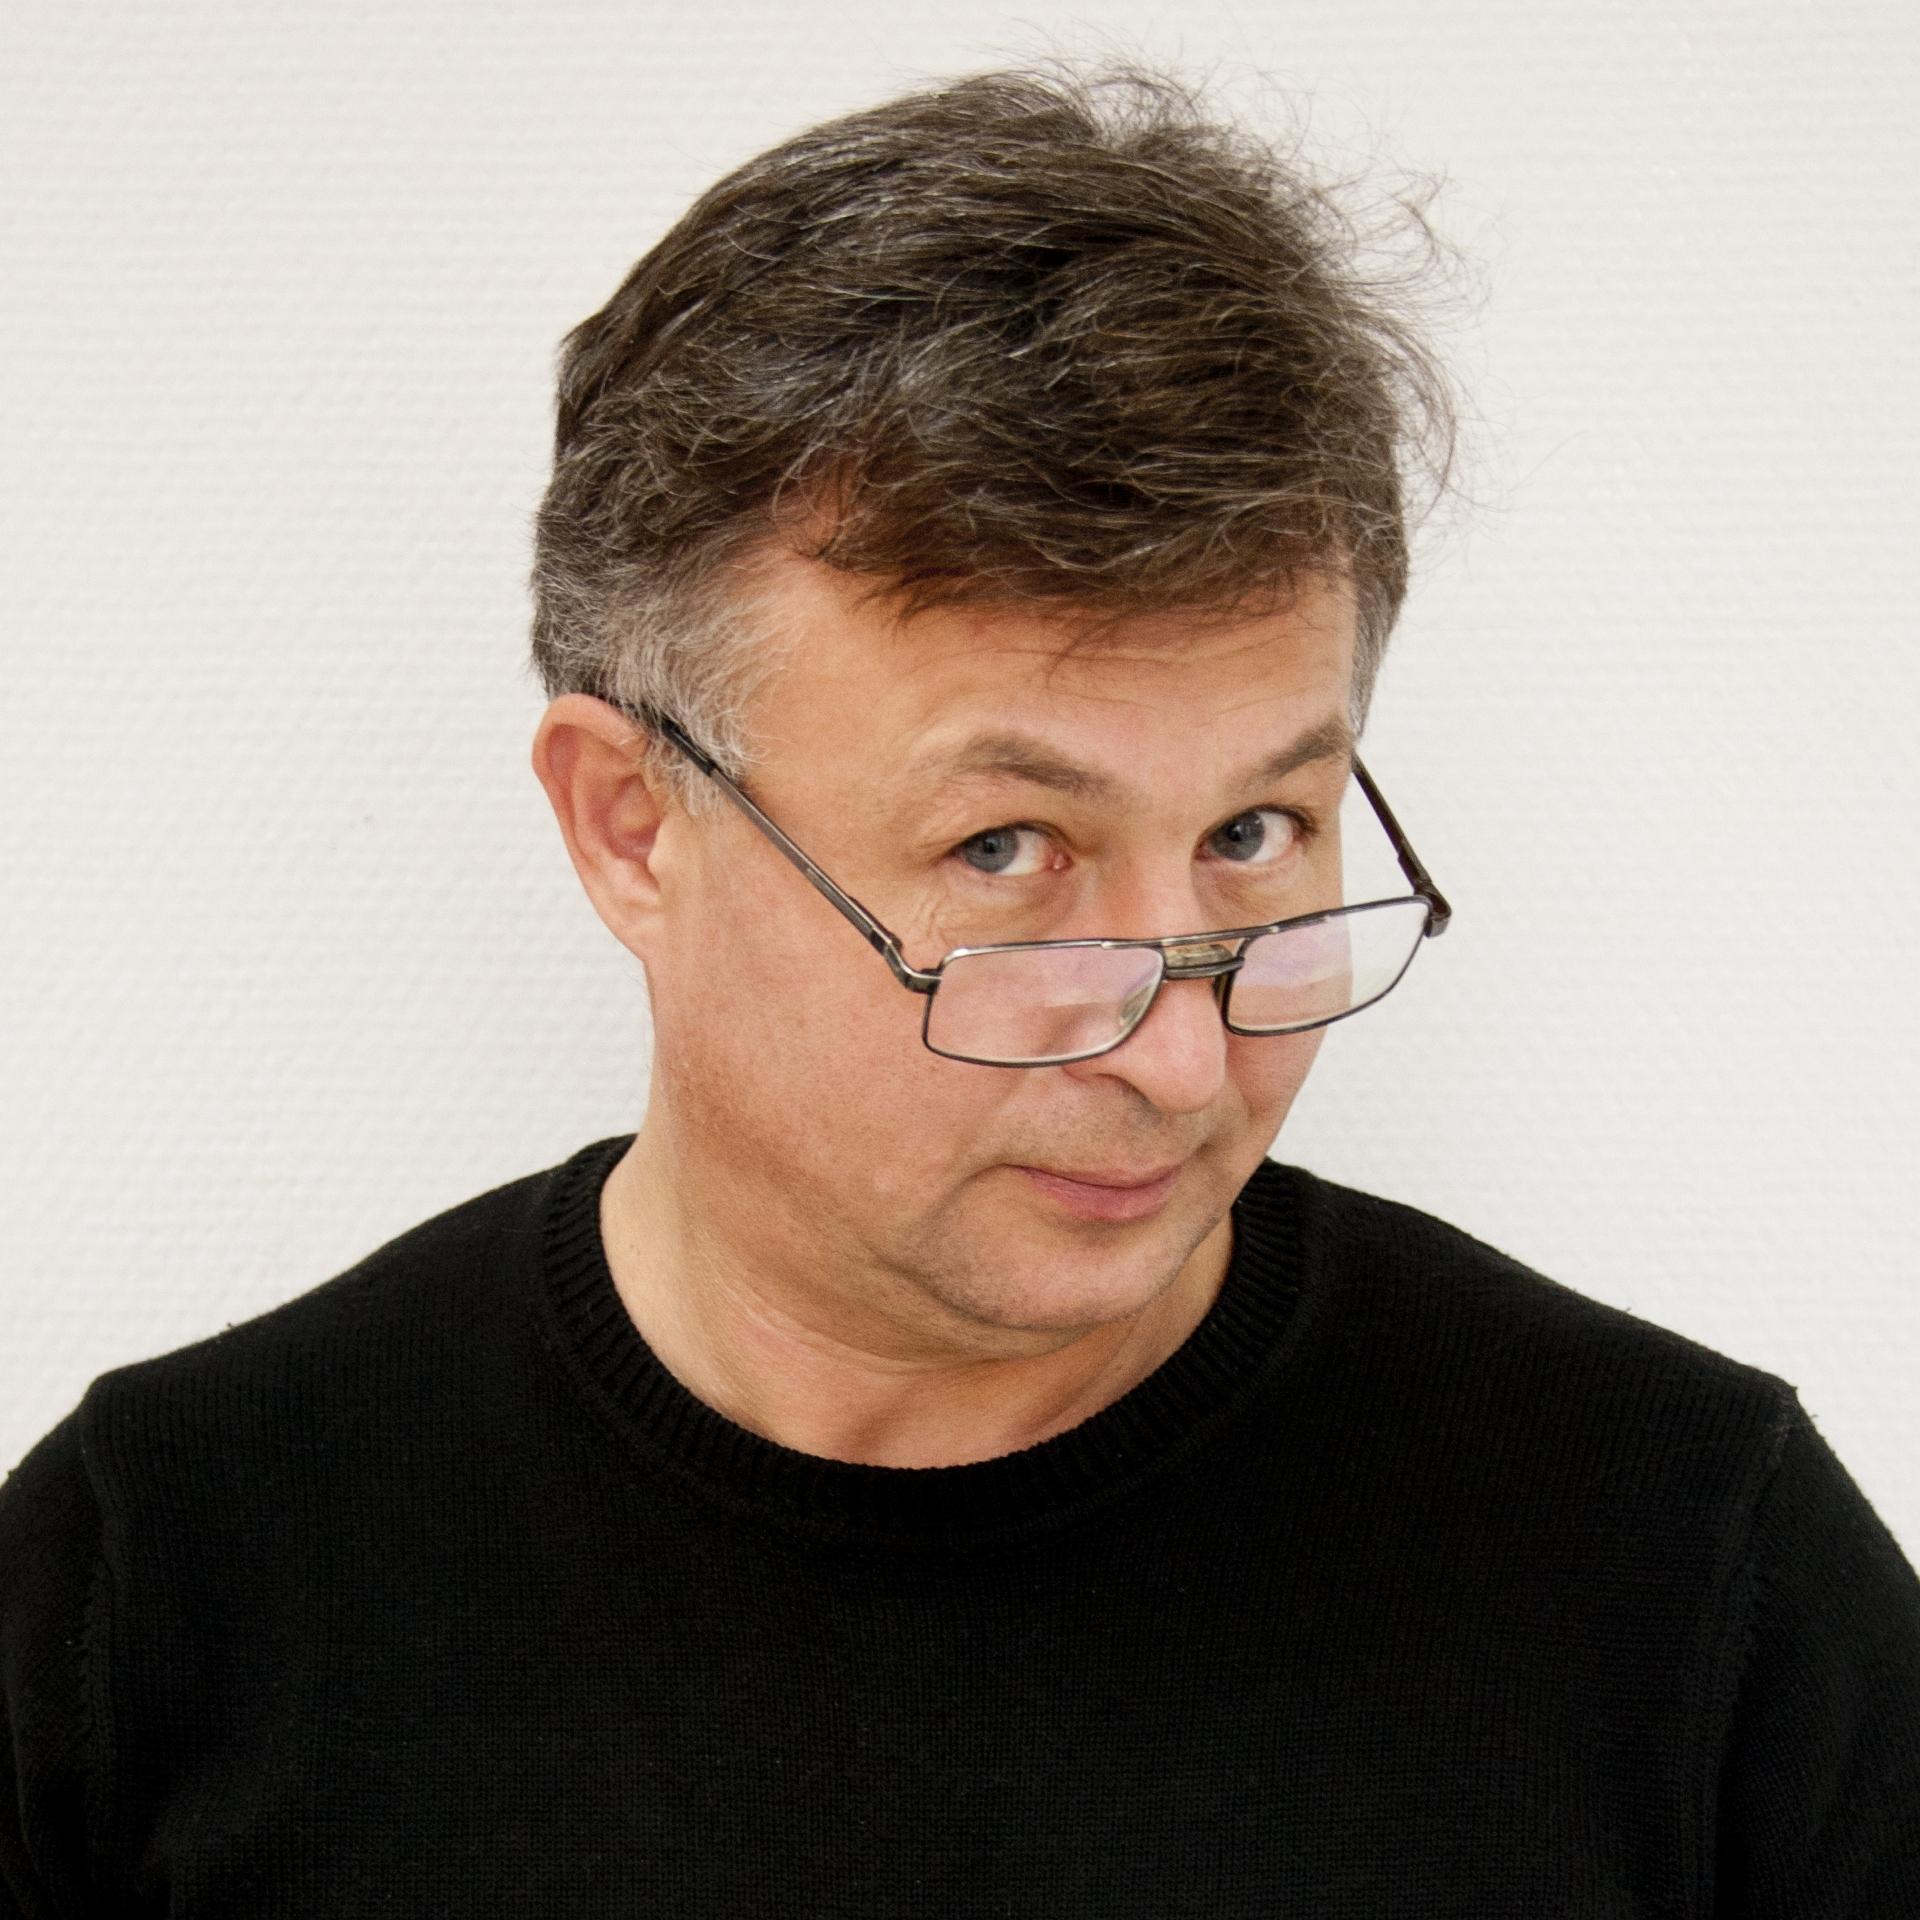 Блинов Алексей Михайлович